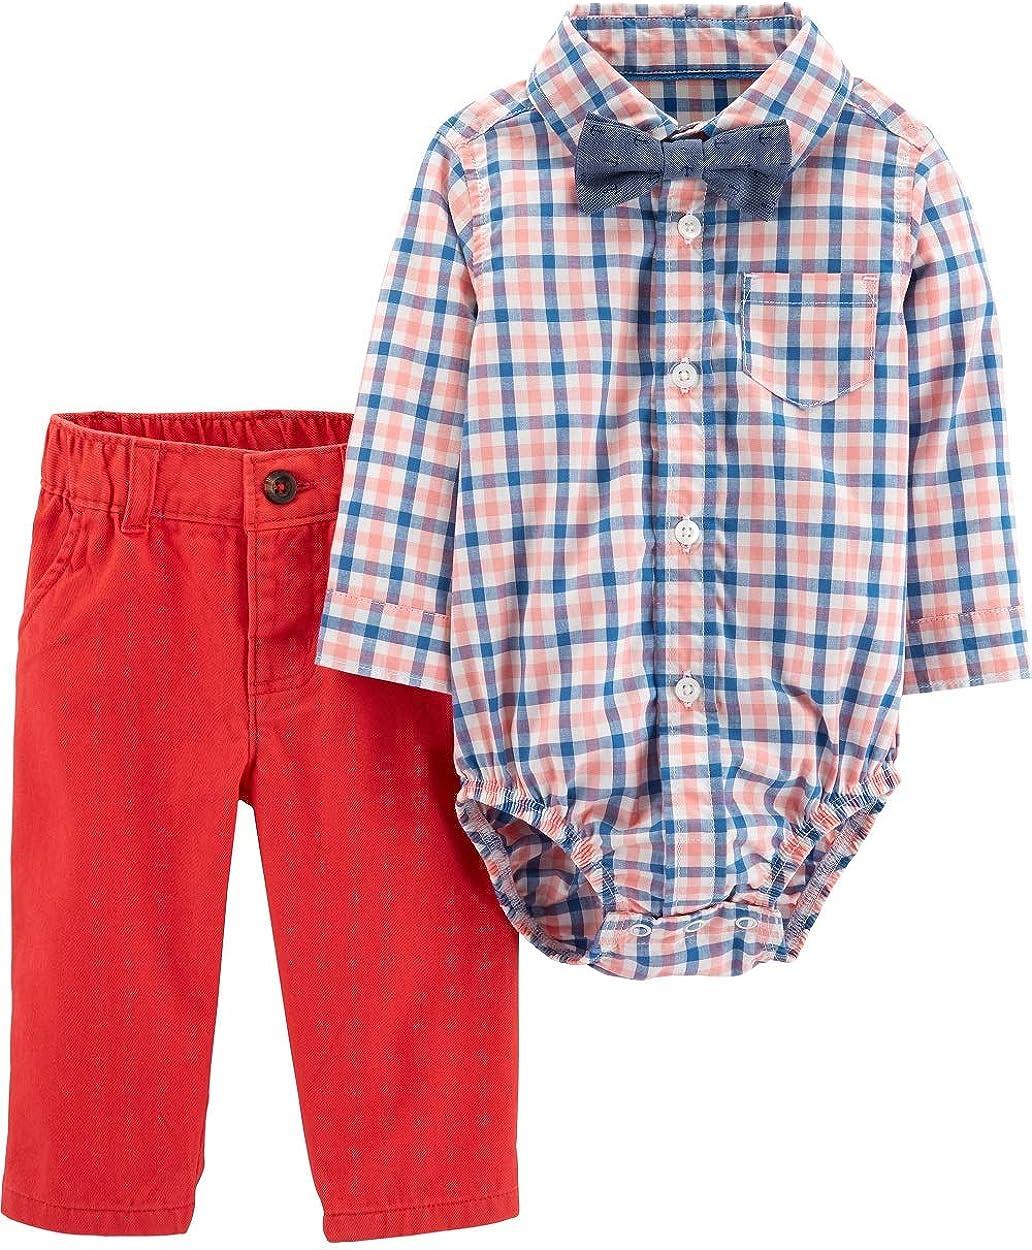 Carter's Infant Boys Coral Plaid Flannel Button Up Shirt Bowtie & Jeans Outfit